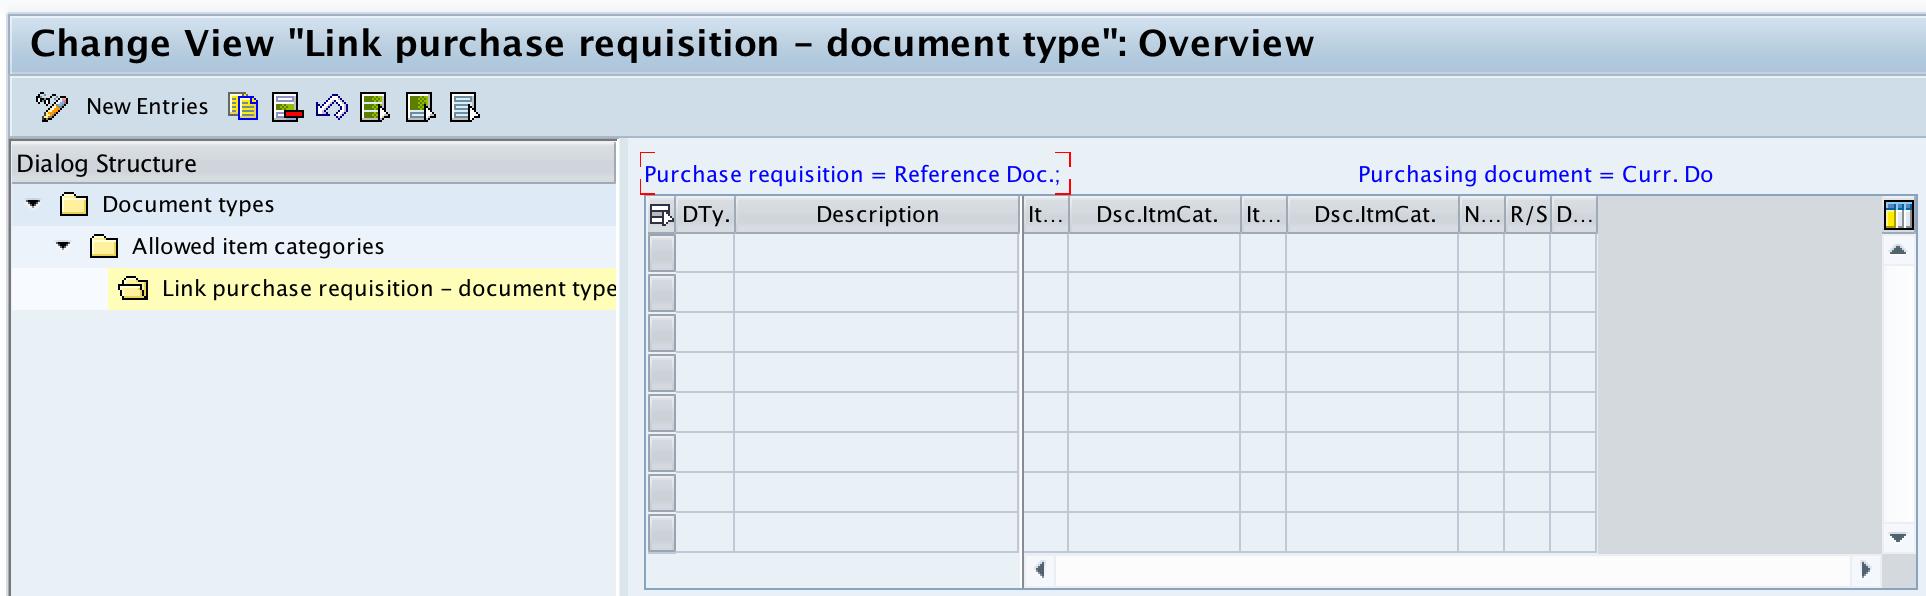 Link PR - document type RFQ new entries SAP